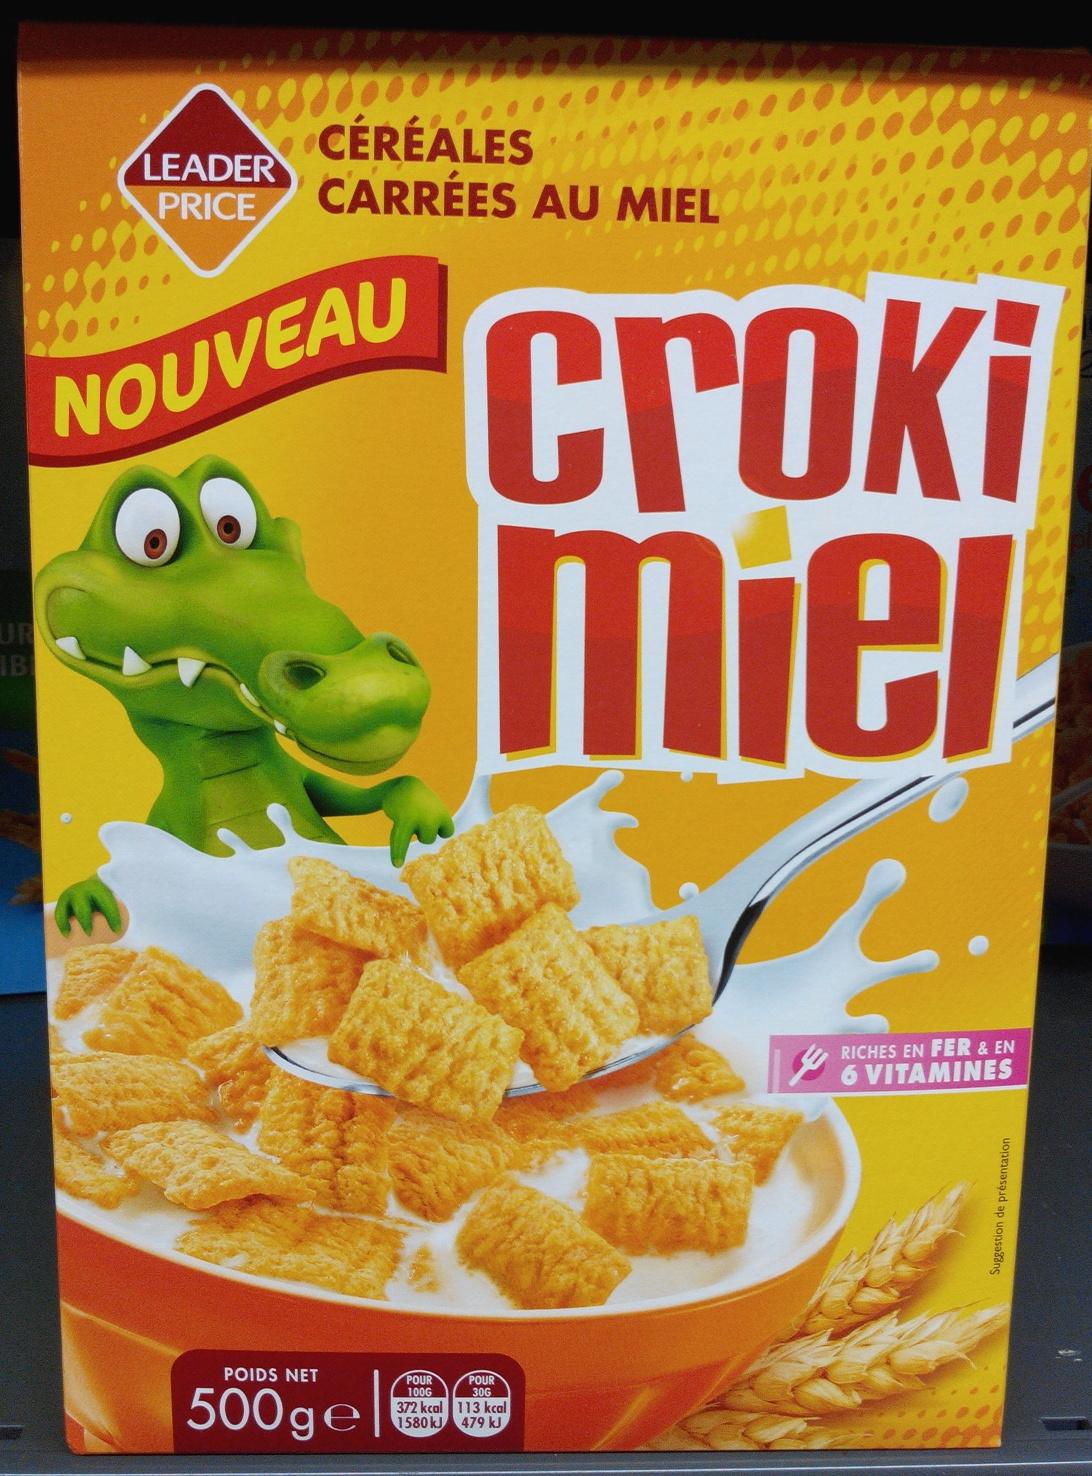 Croki miel - Produit - fr